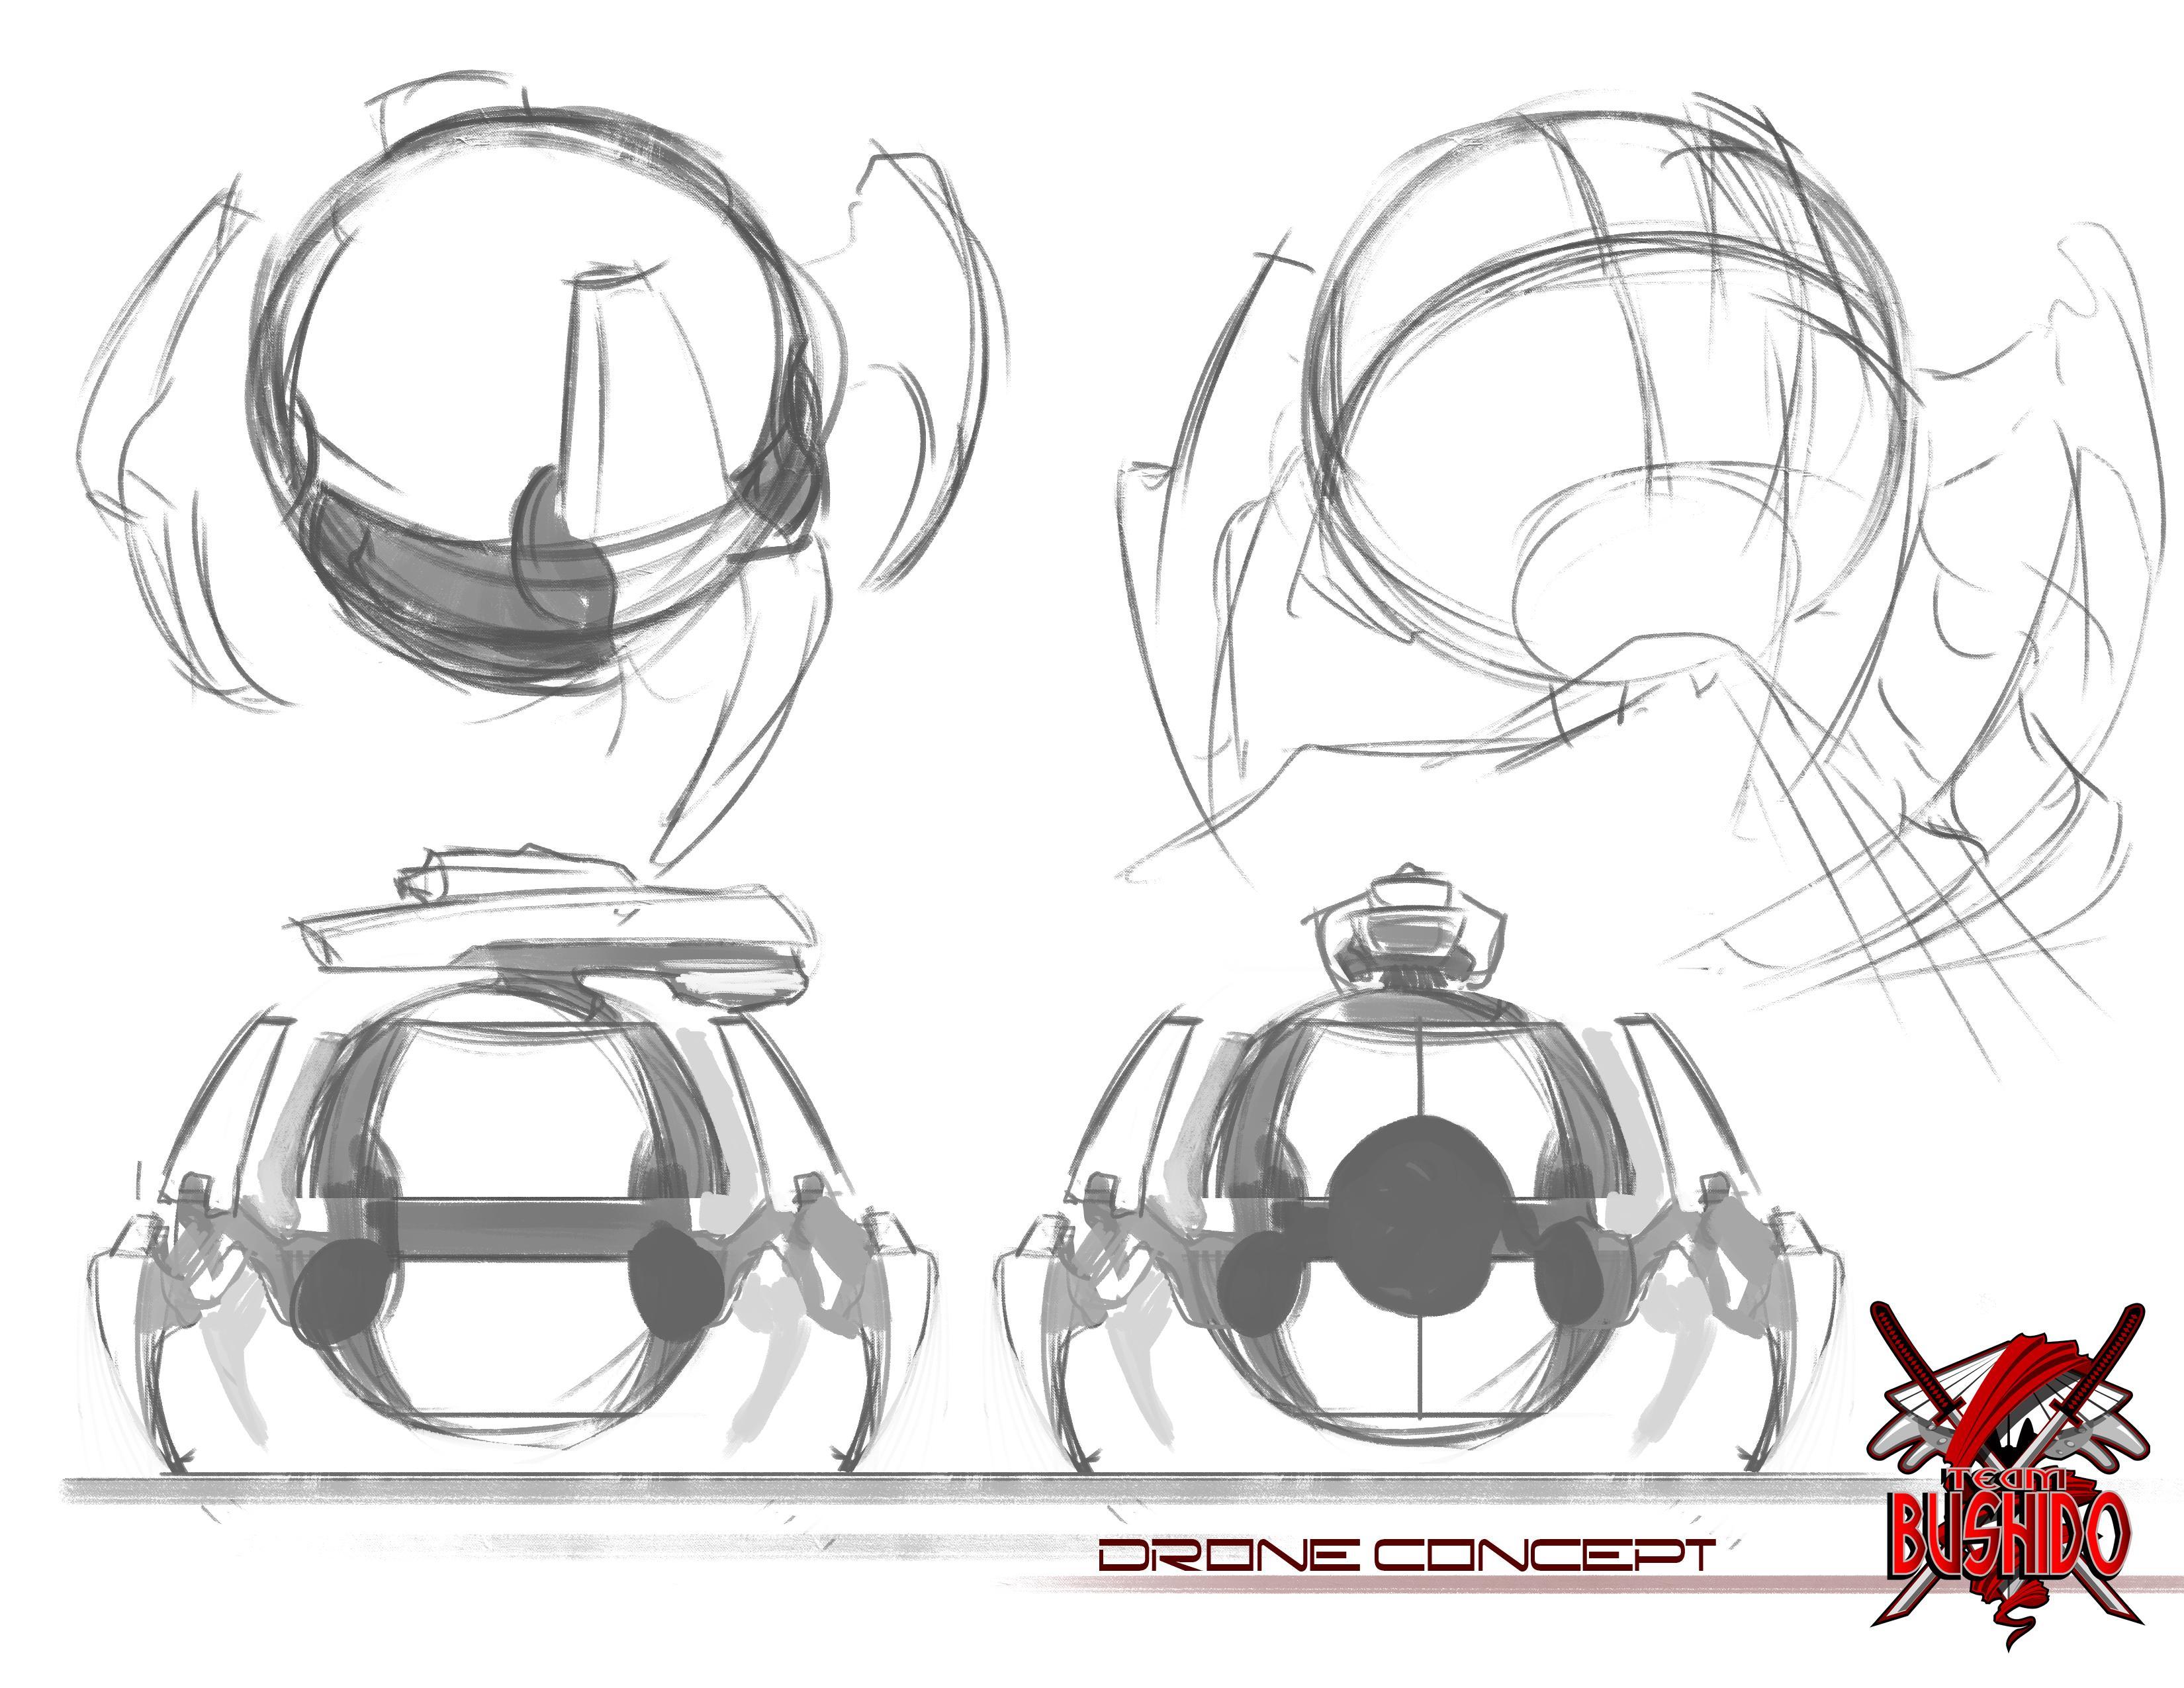 Team Bushido Drone Concept